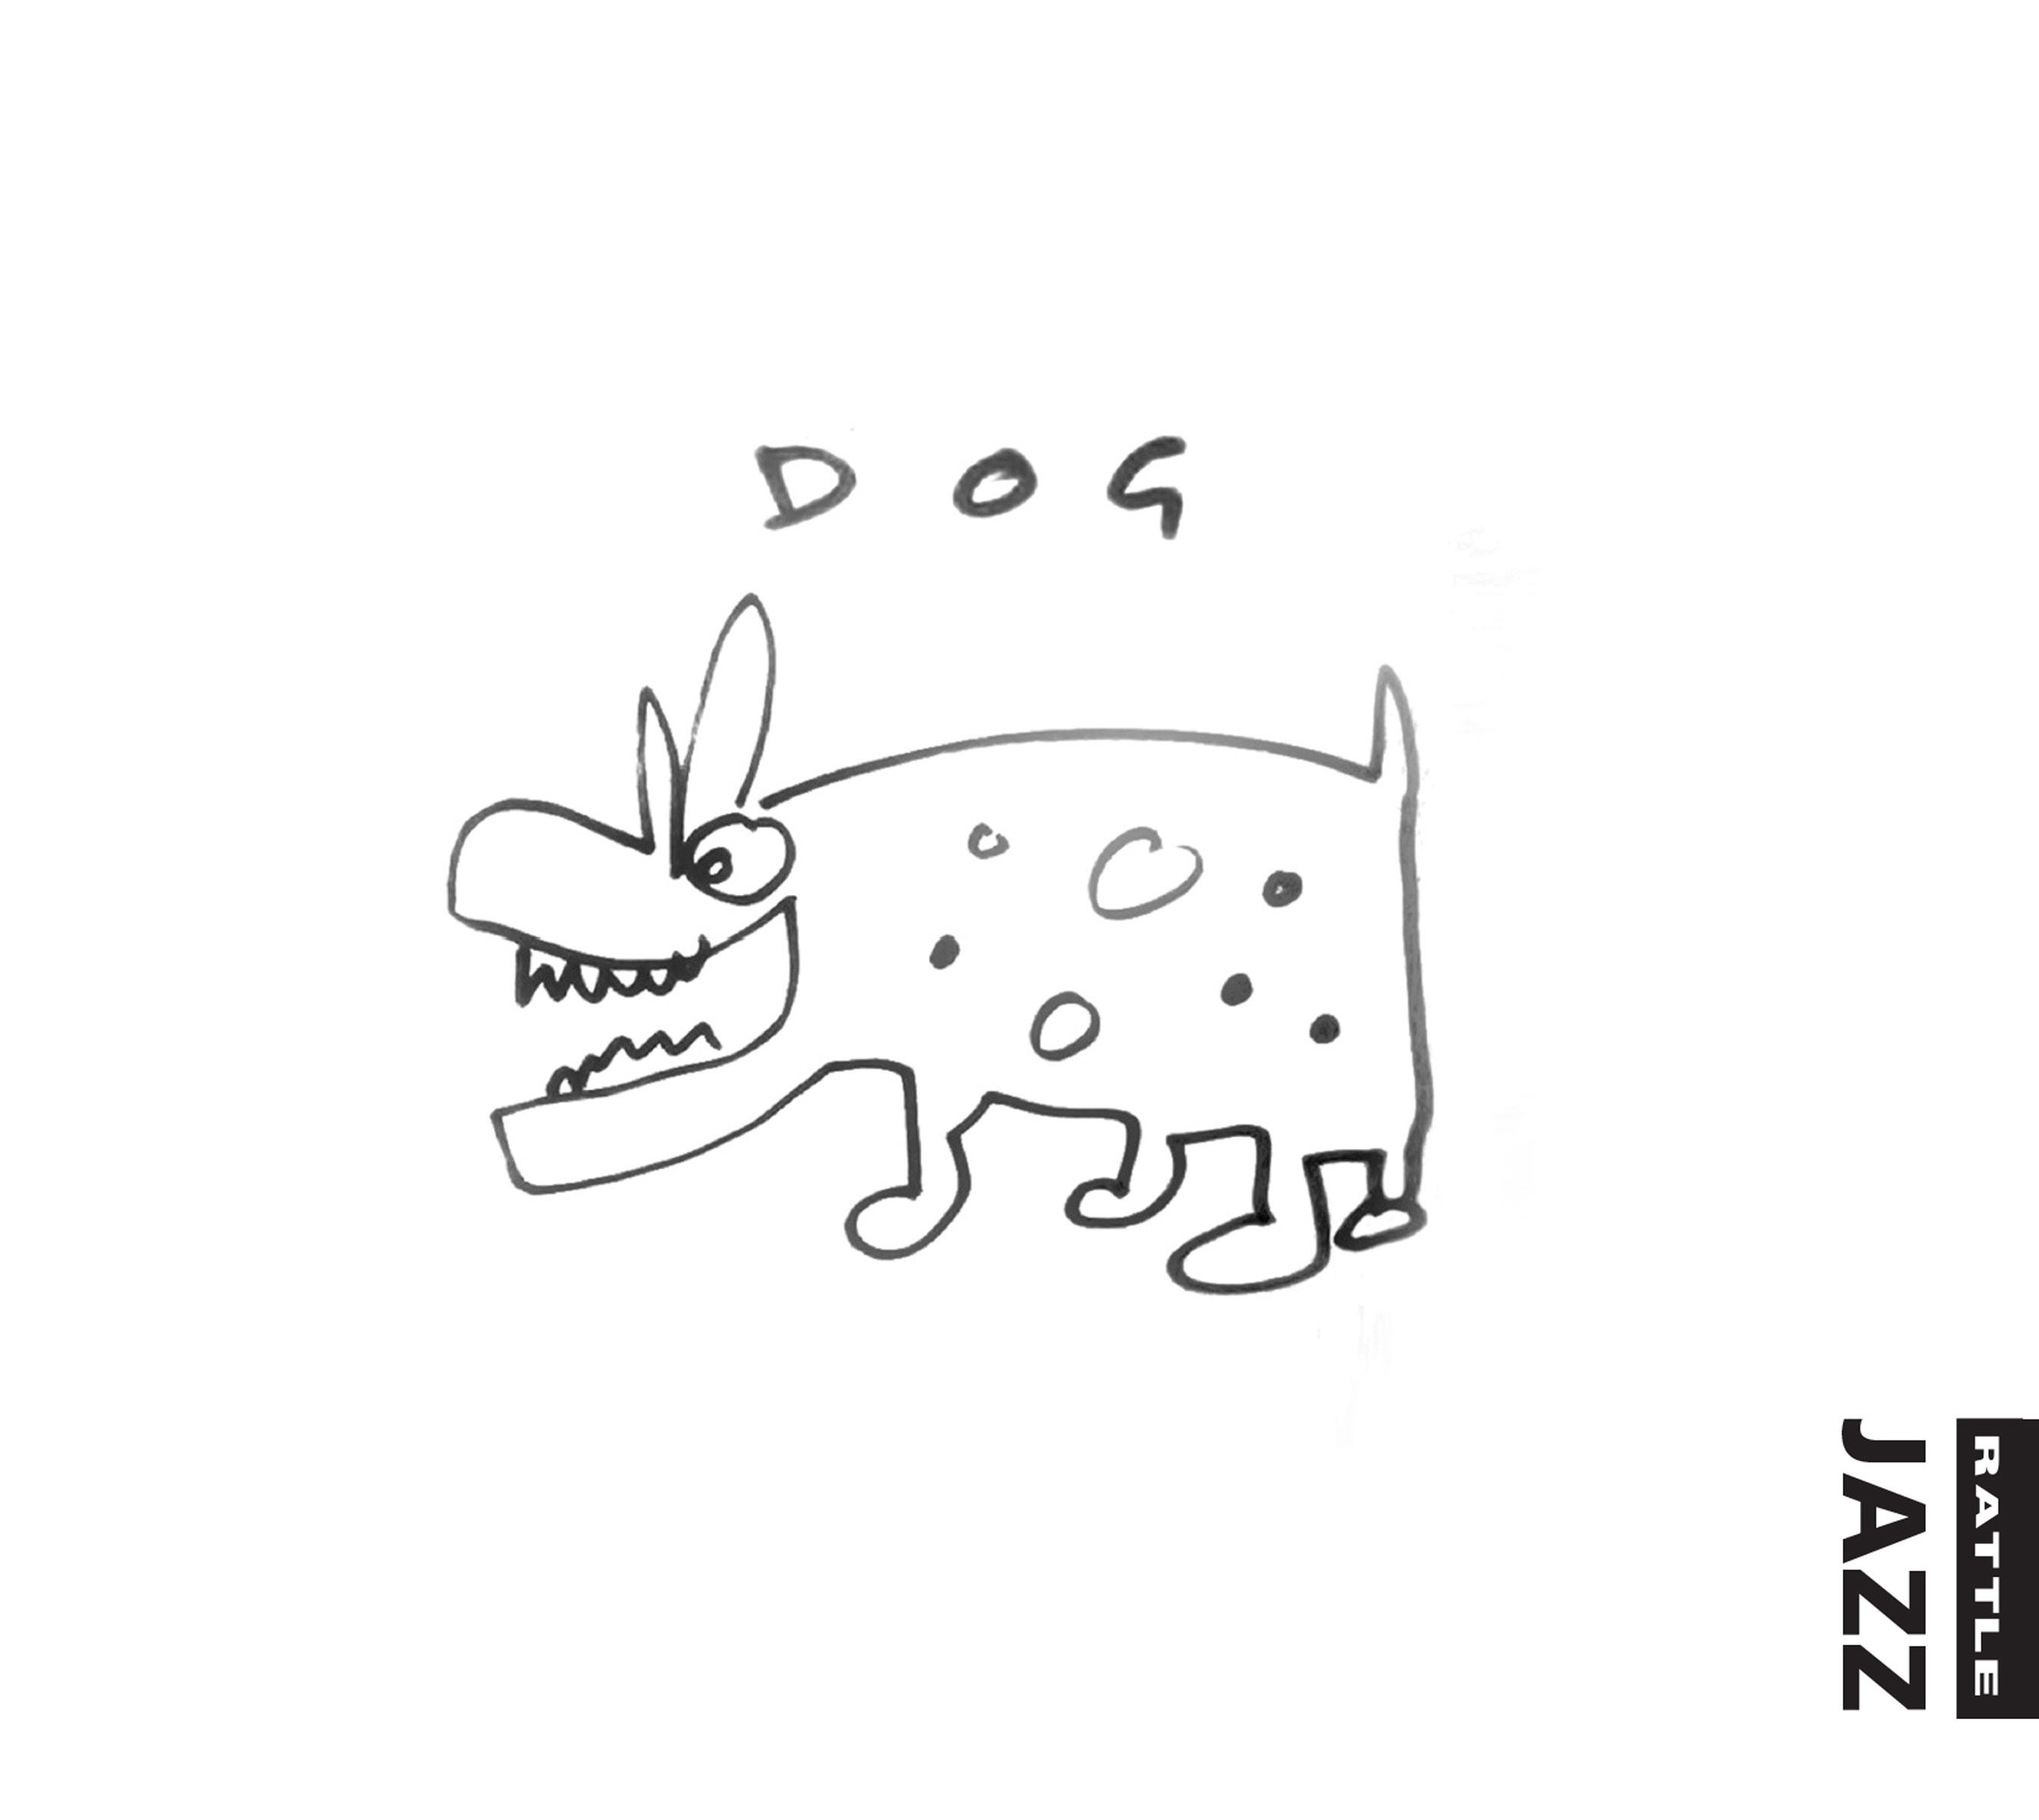 Dog | Dog - downloadable MP3 ALBUM